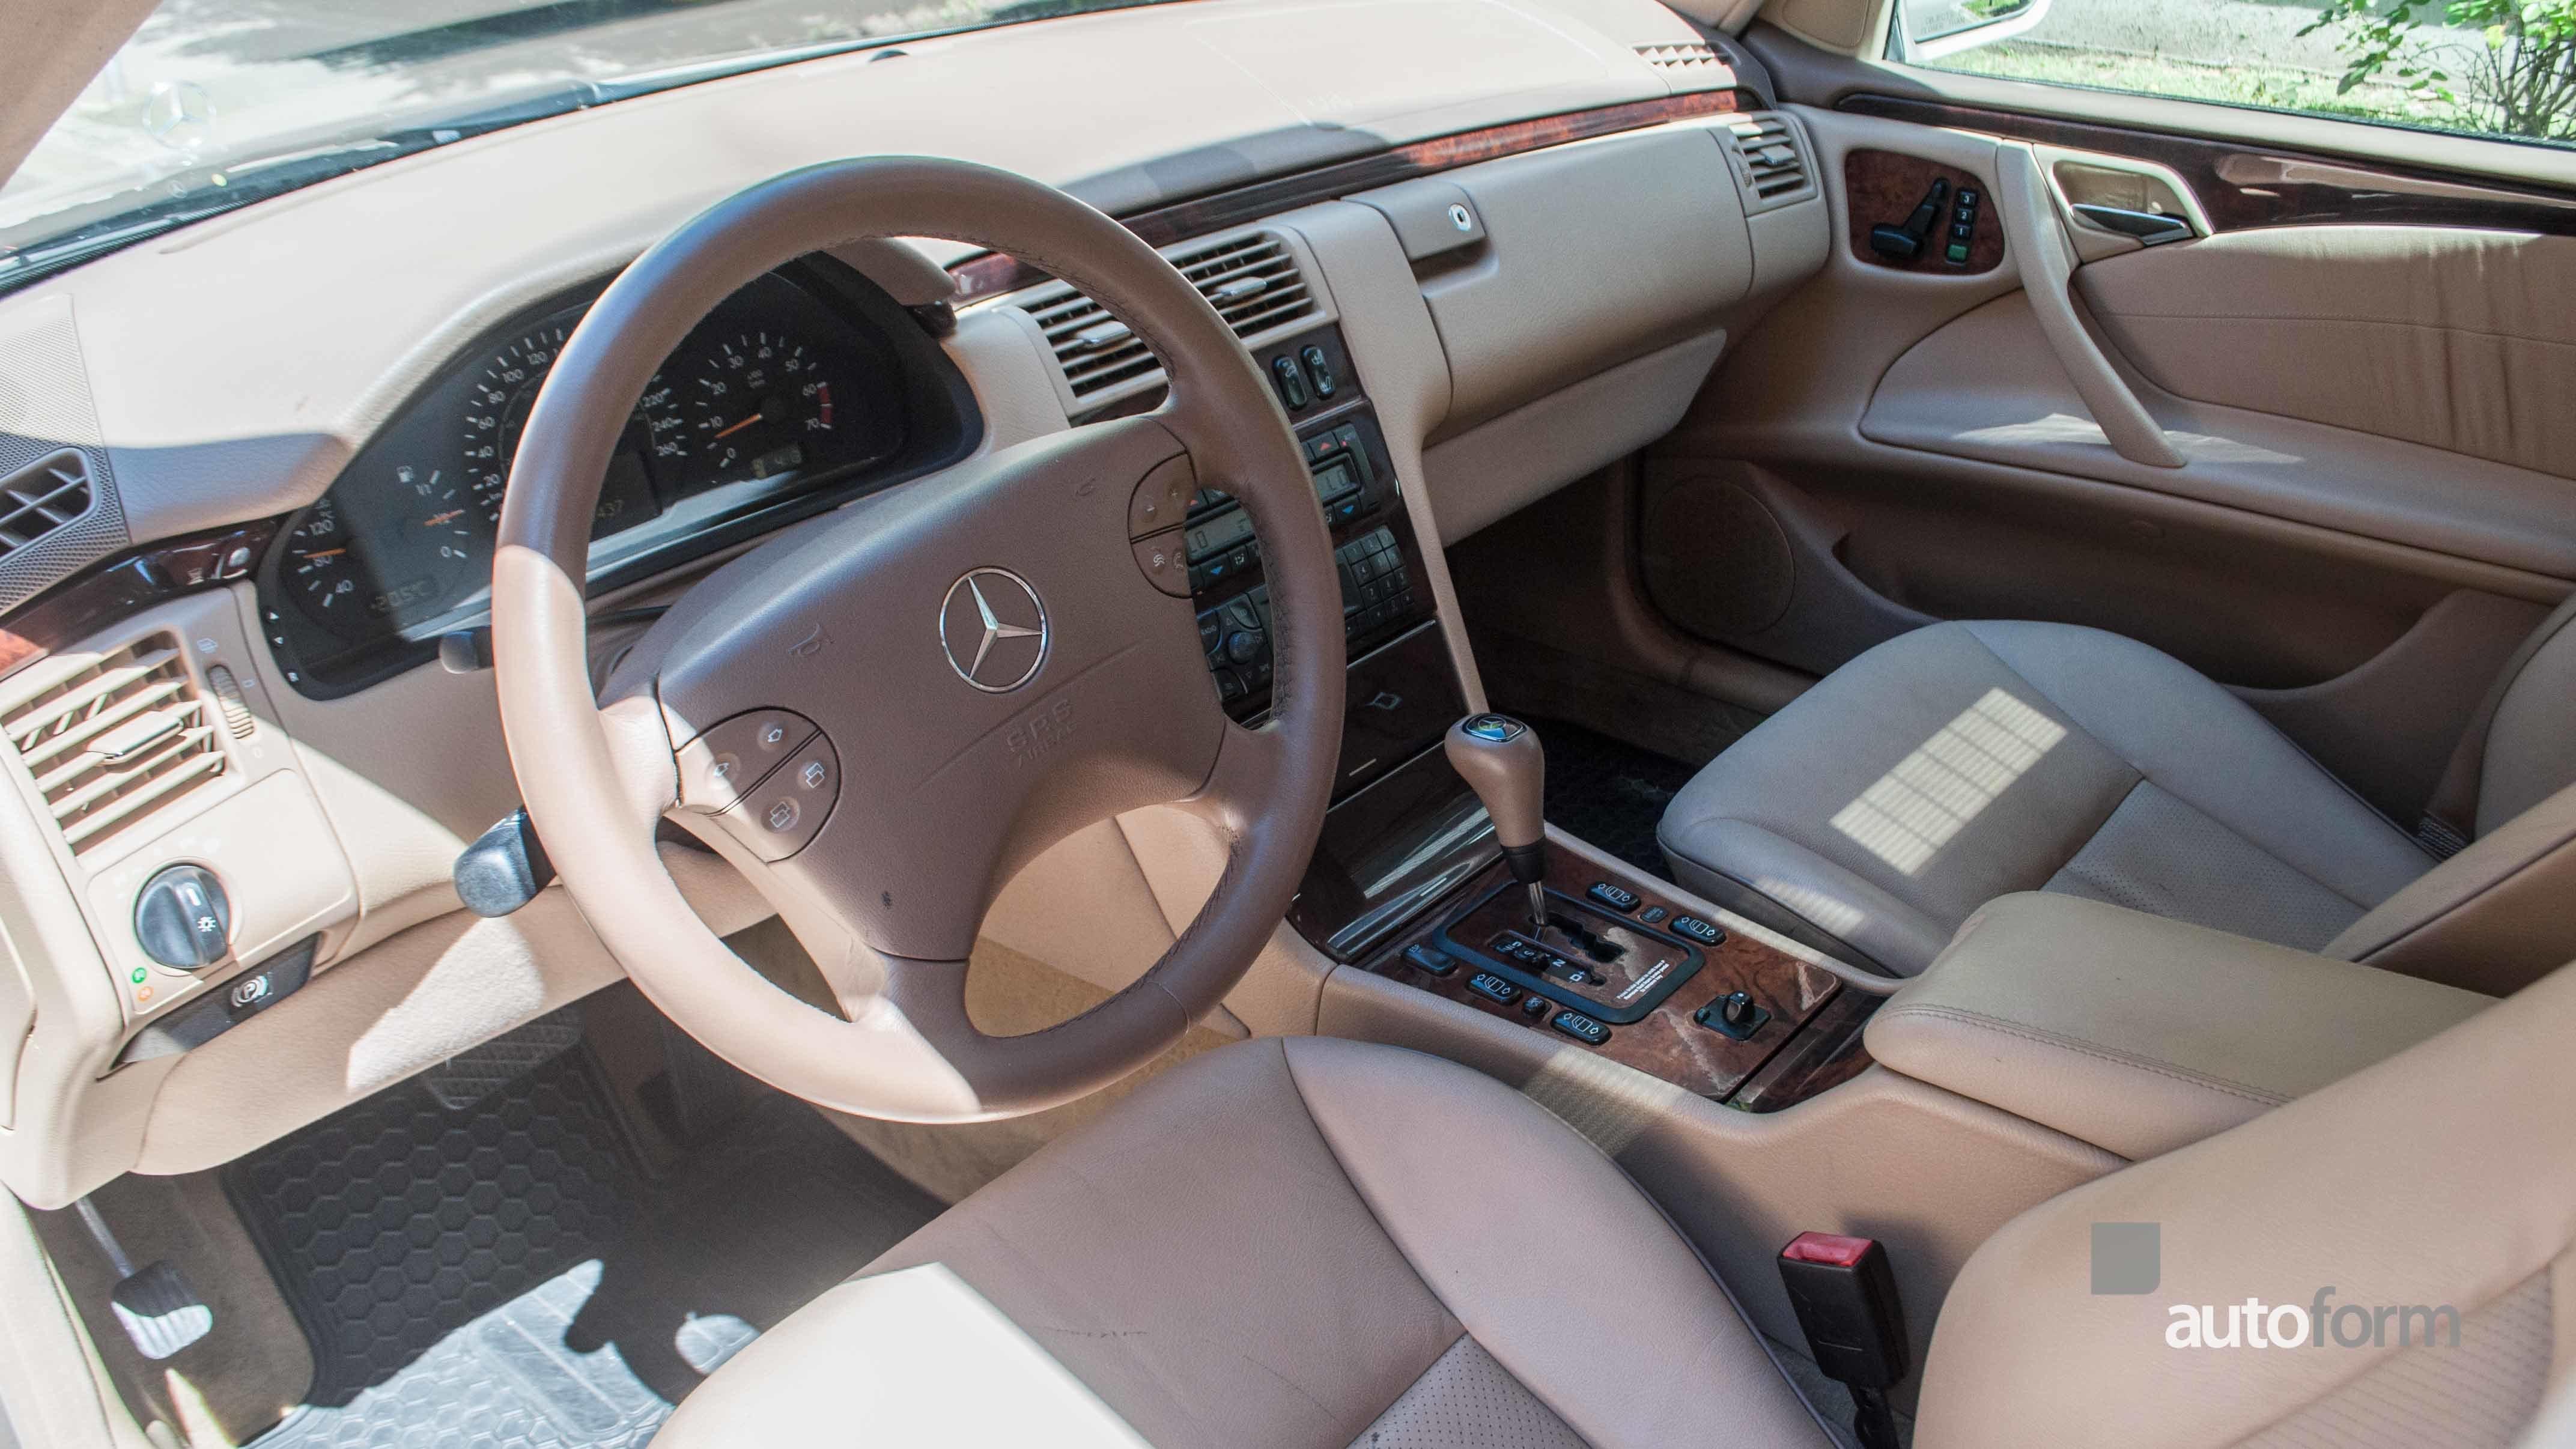 2000 mercedes benz e320 autoform. Black Bedroom Furniture Sets. Home Design Ideas